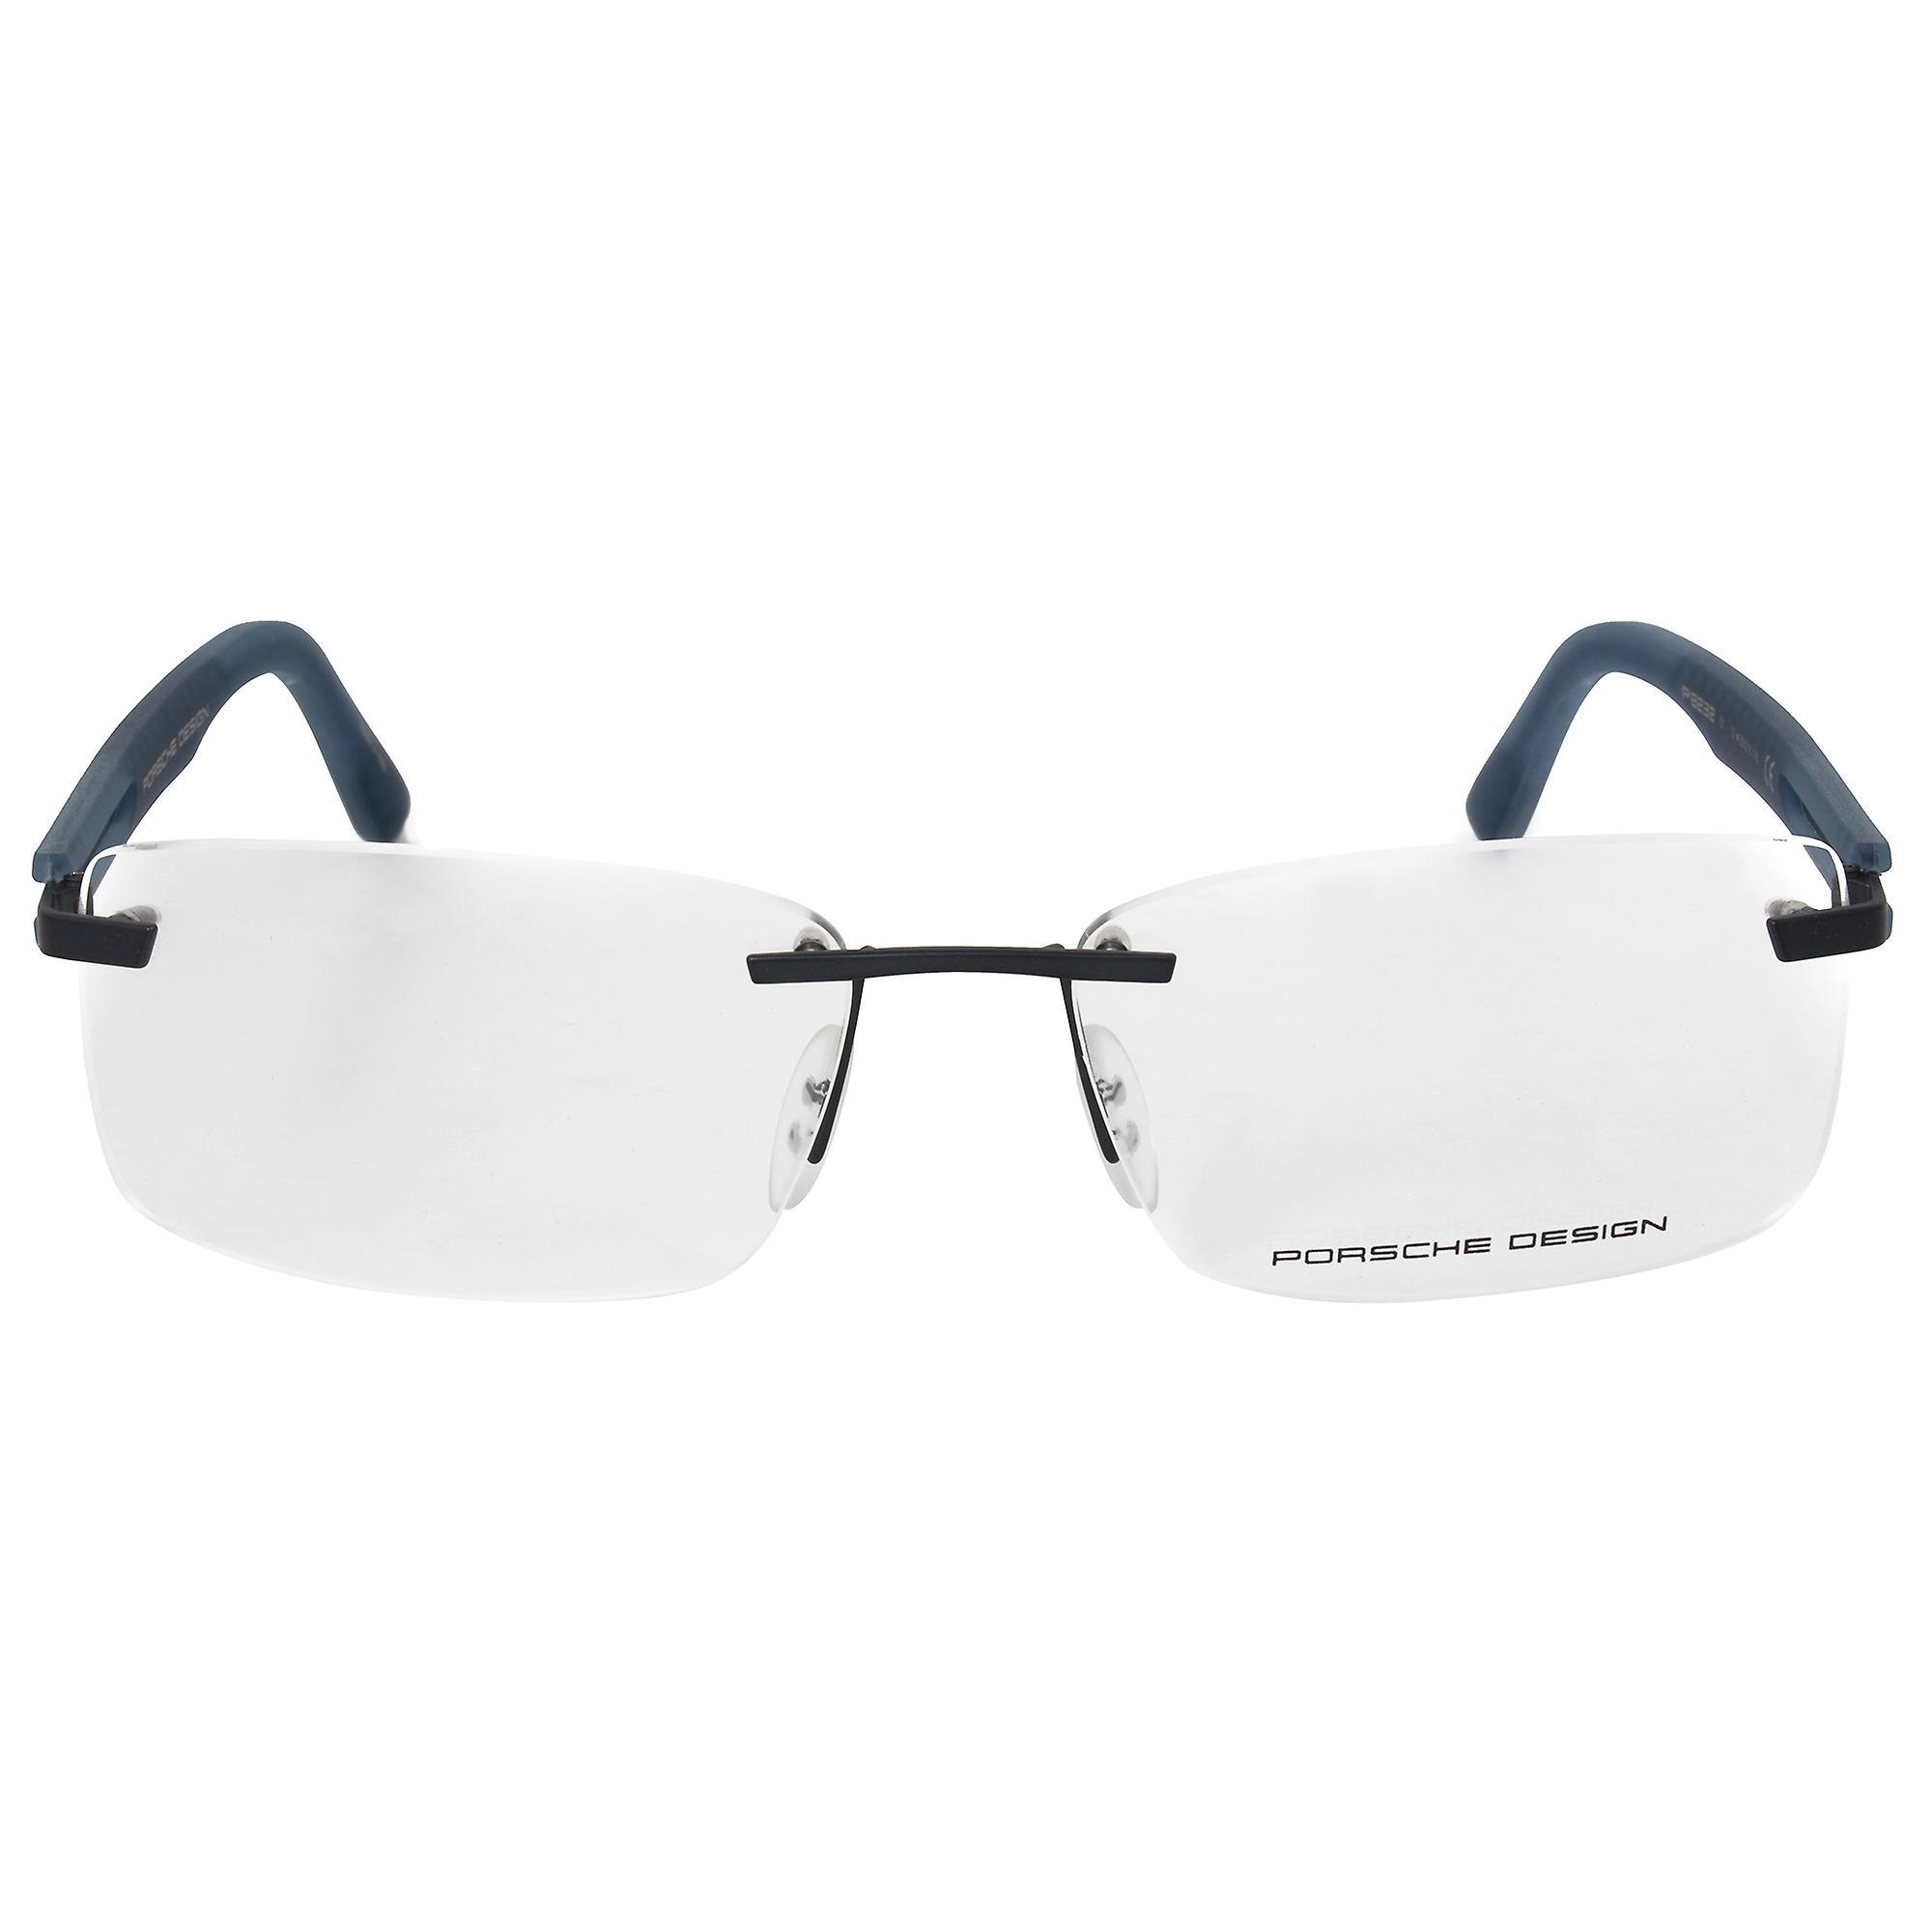 Porsche Design P8232 D rektangulære | Matt sølv blå | Øyeglasset rammer